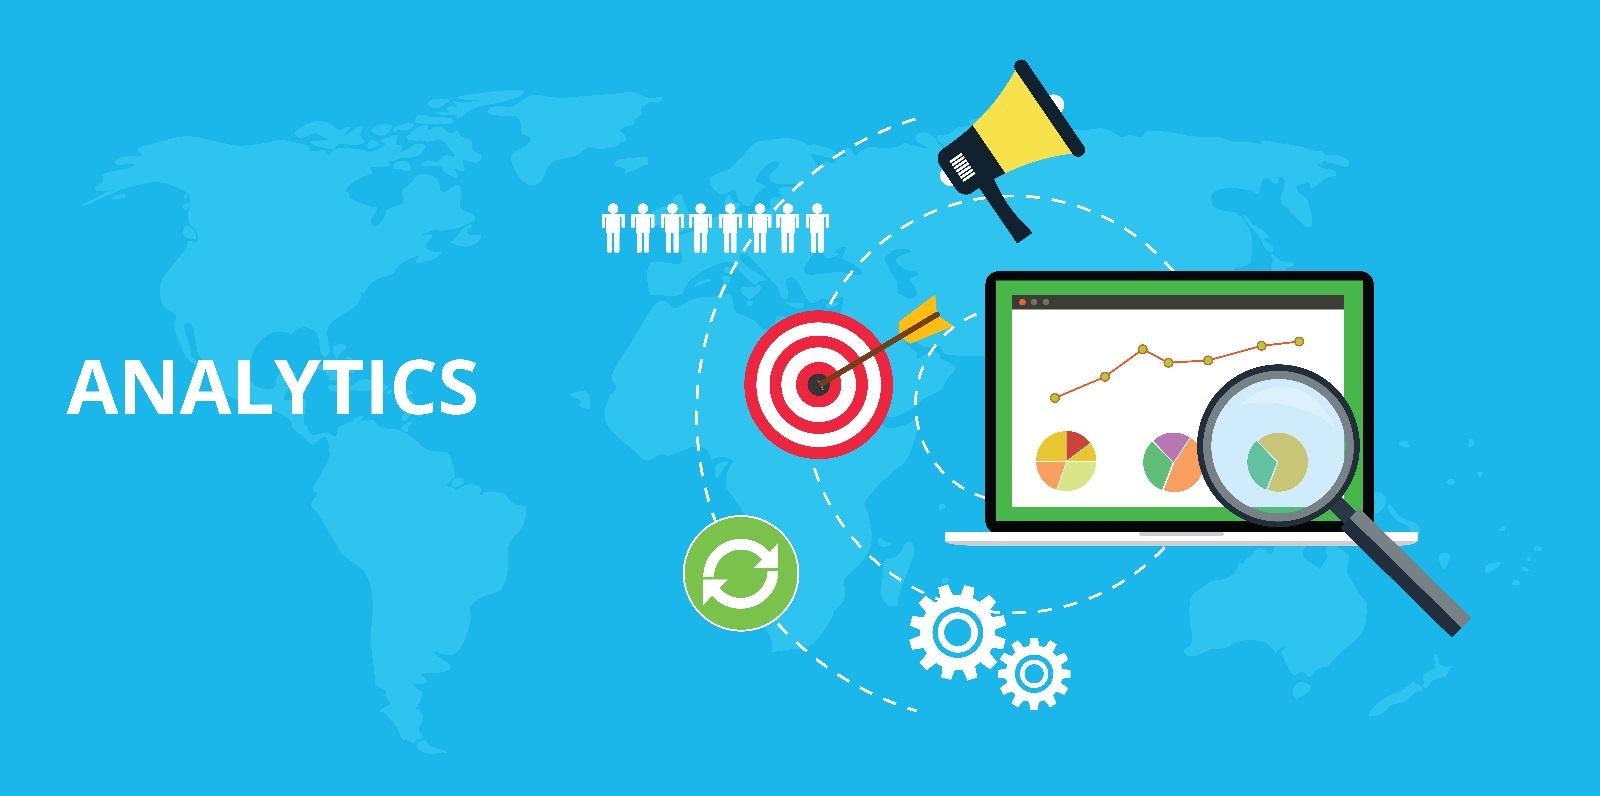 ADKマーケティング・ソリューションズ、株式会社プリンシプルと共同で「Googleアナリティクス」「SEO」解析・診断サービス『ADK - シンダン』の提供を開始